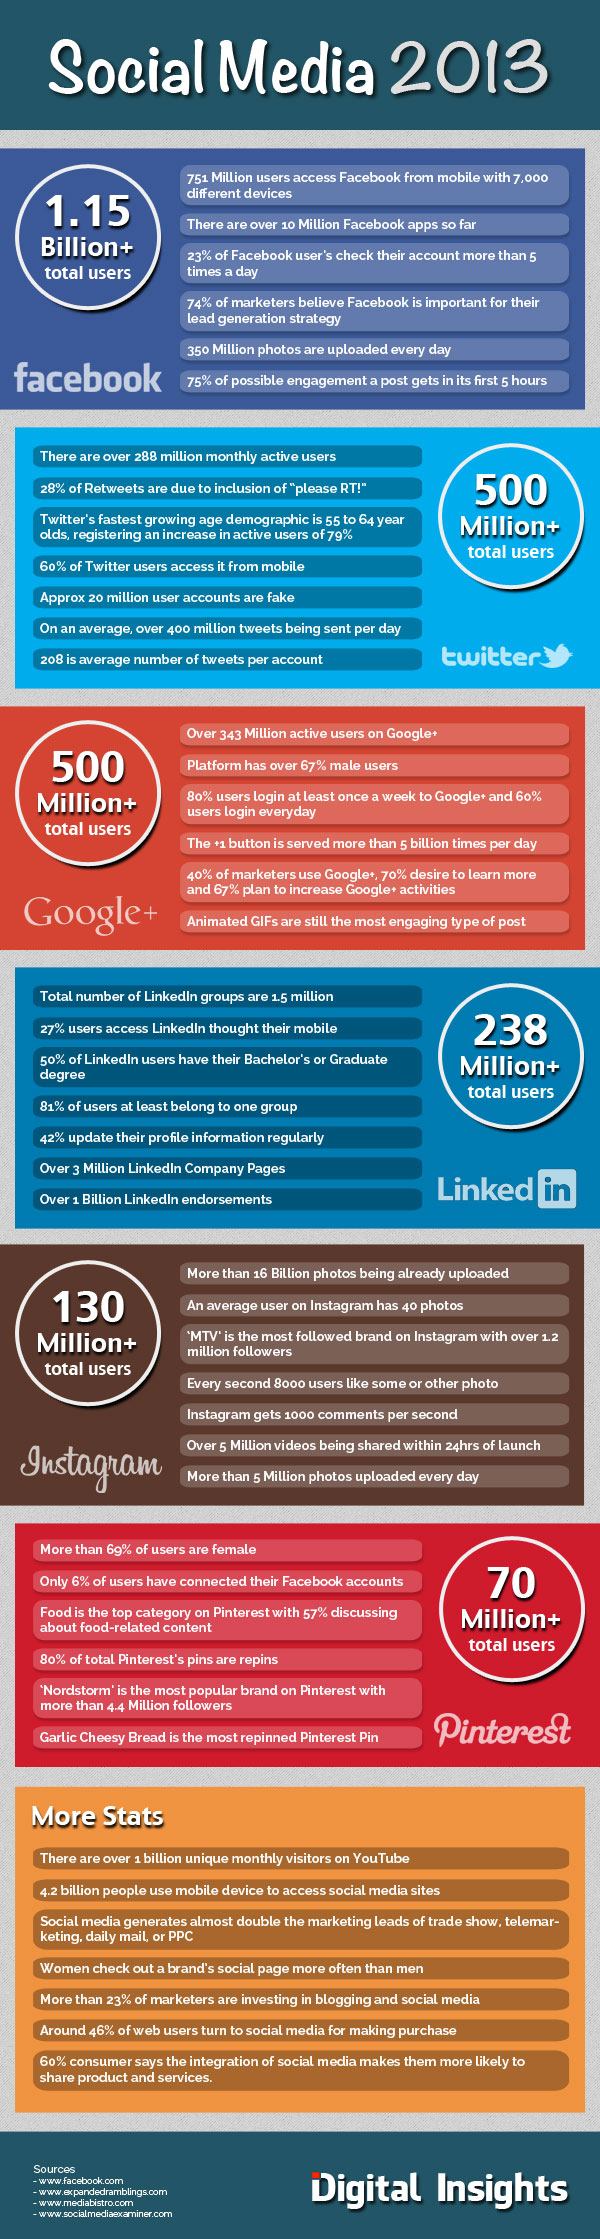 Social Media 2013 - Amazing Figures